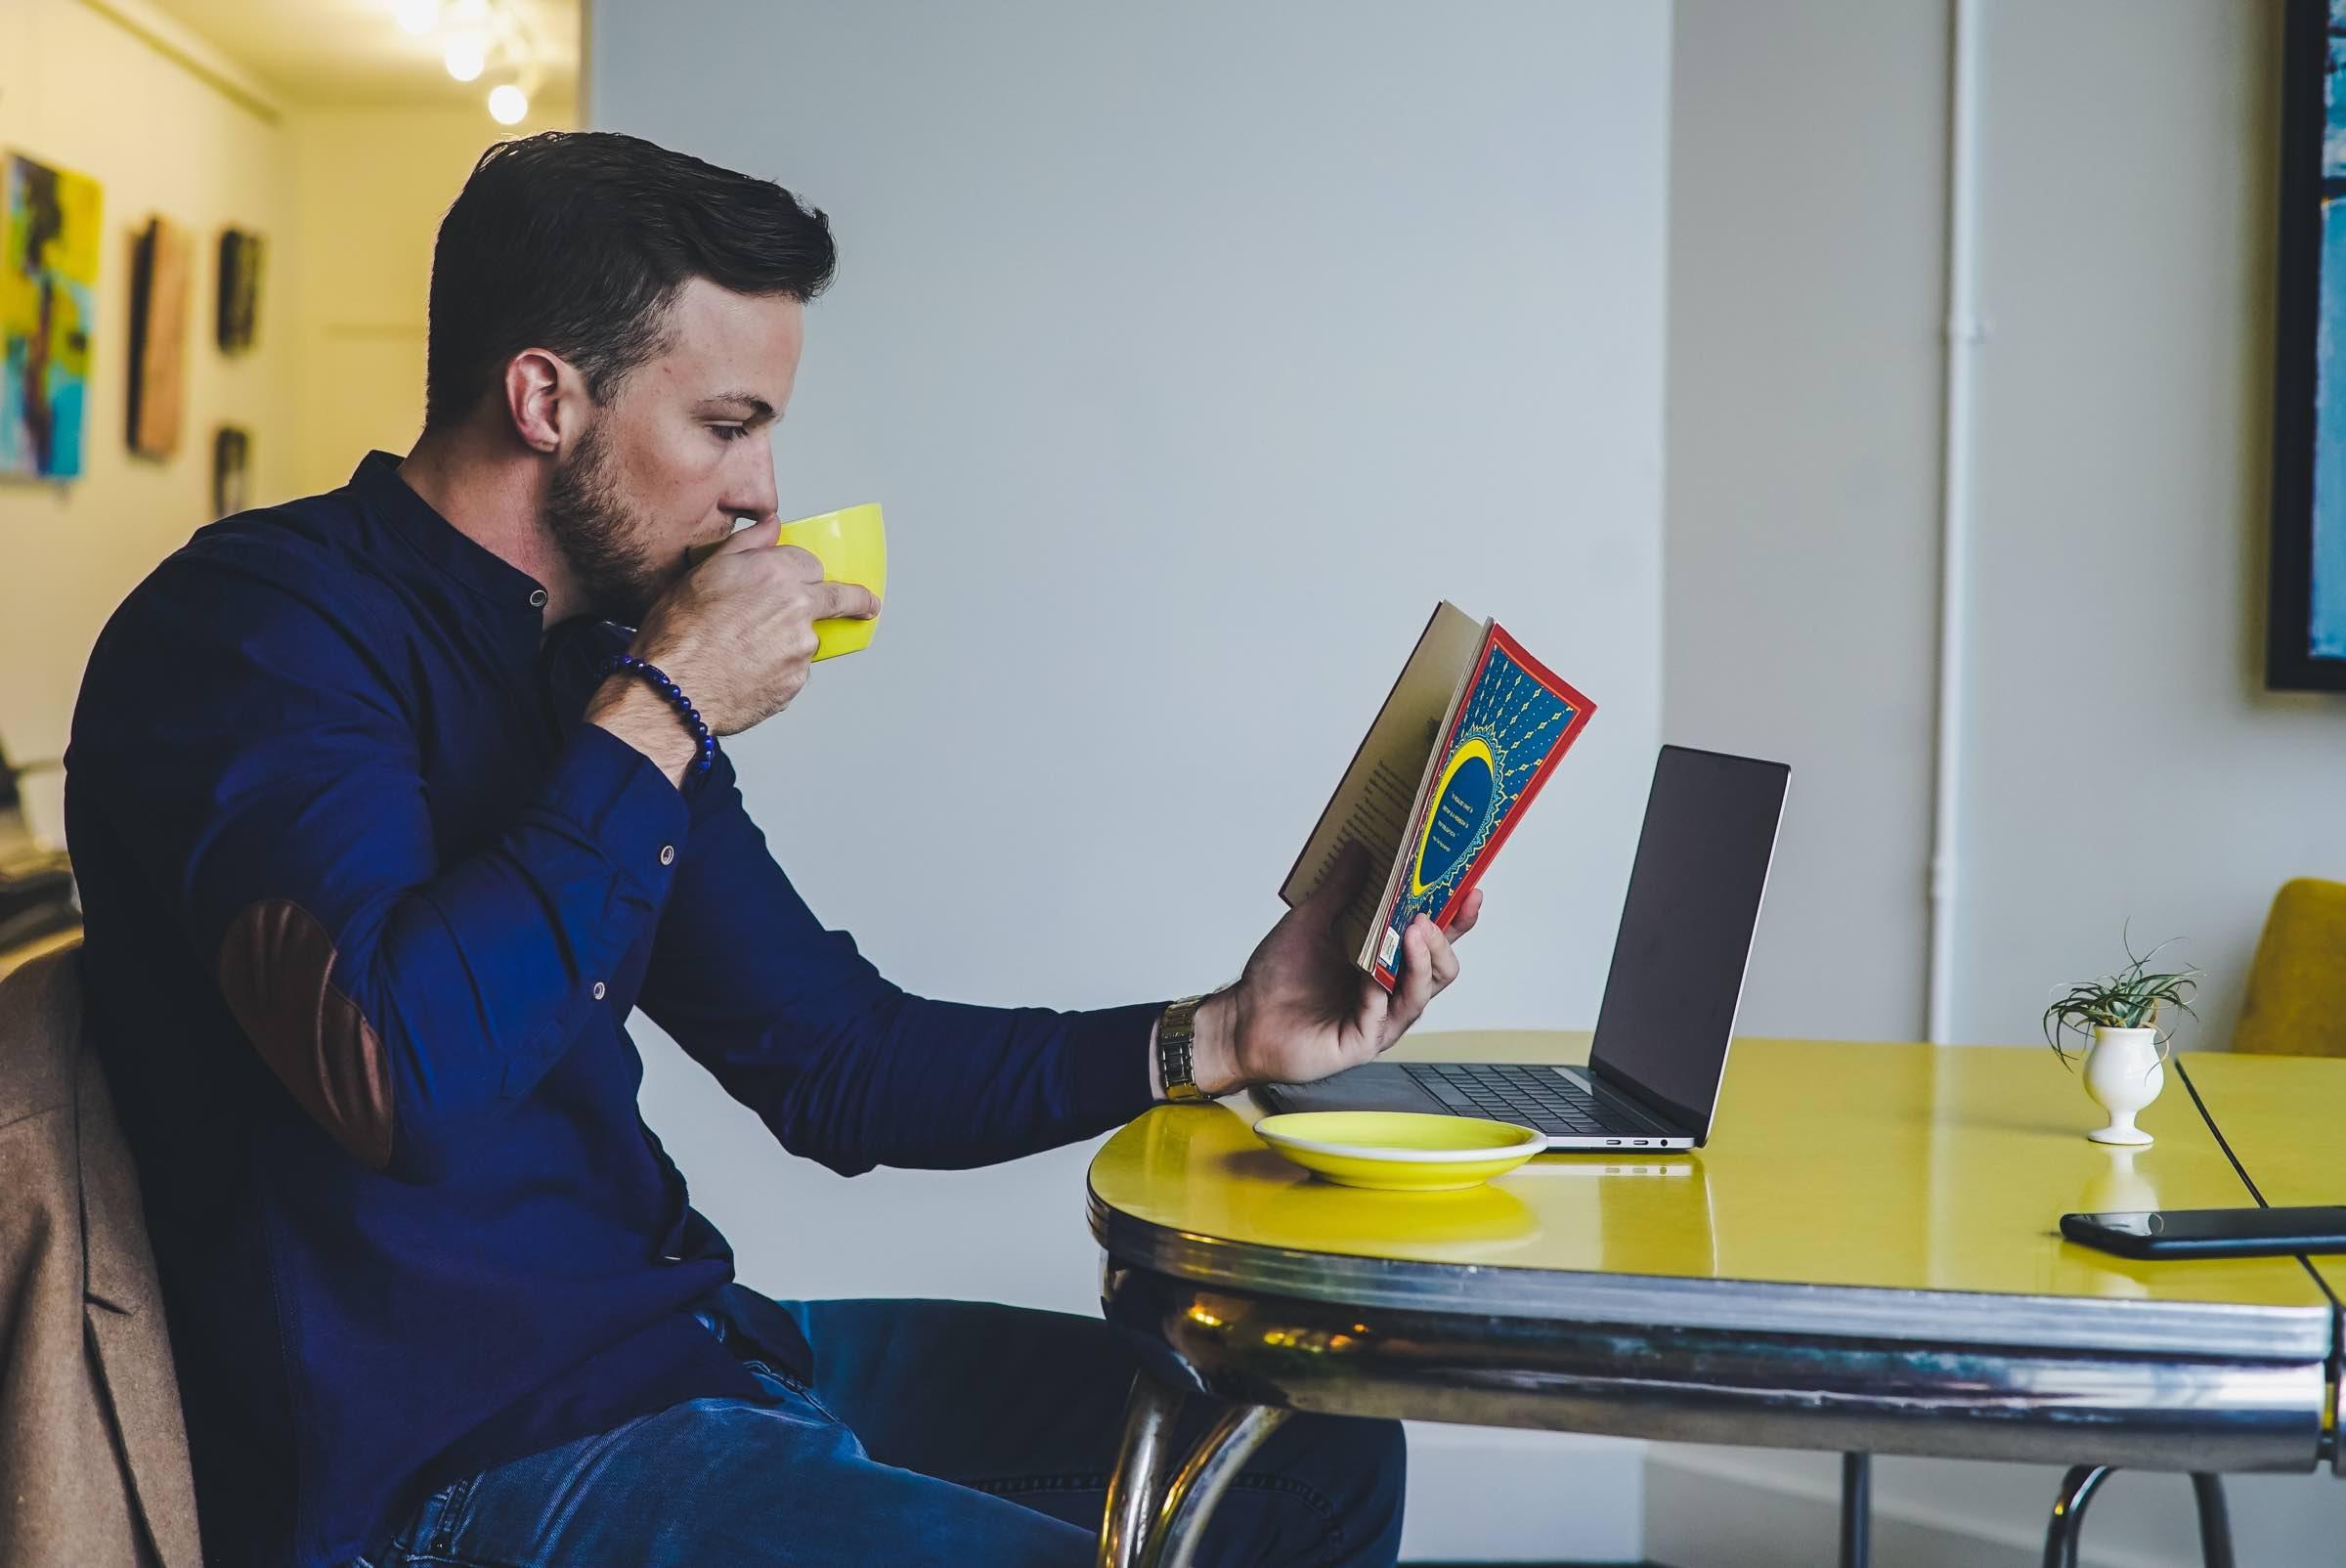 zestful blog image of happy male employee drinking coffee reading magazine